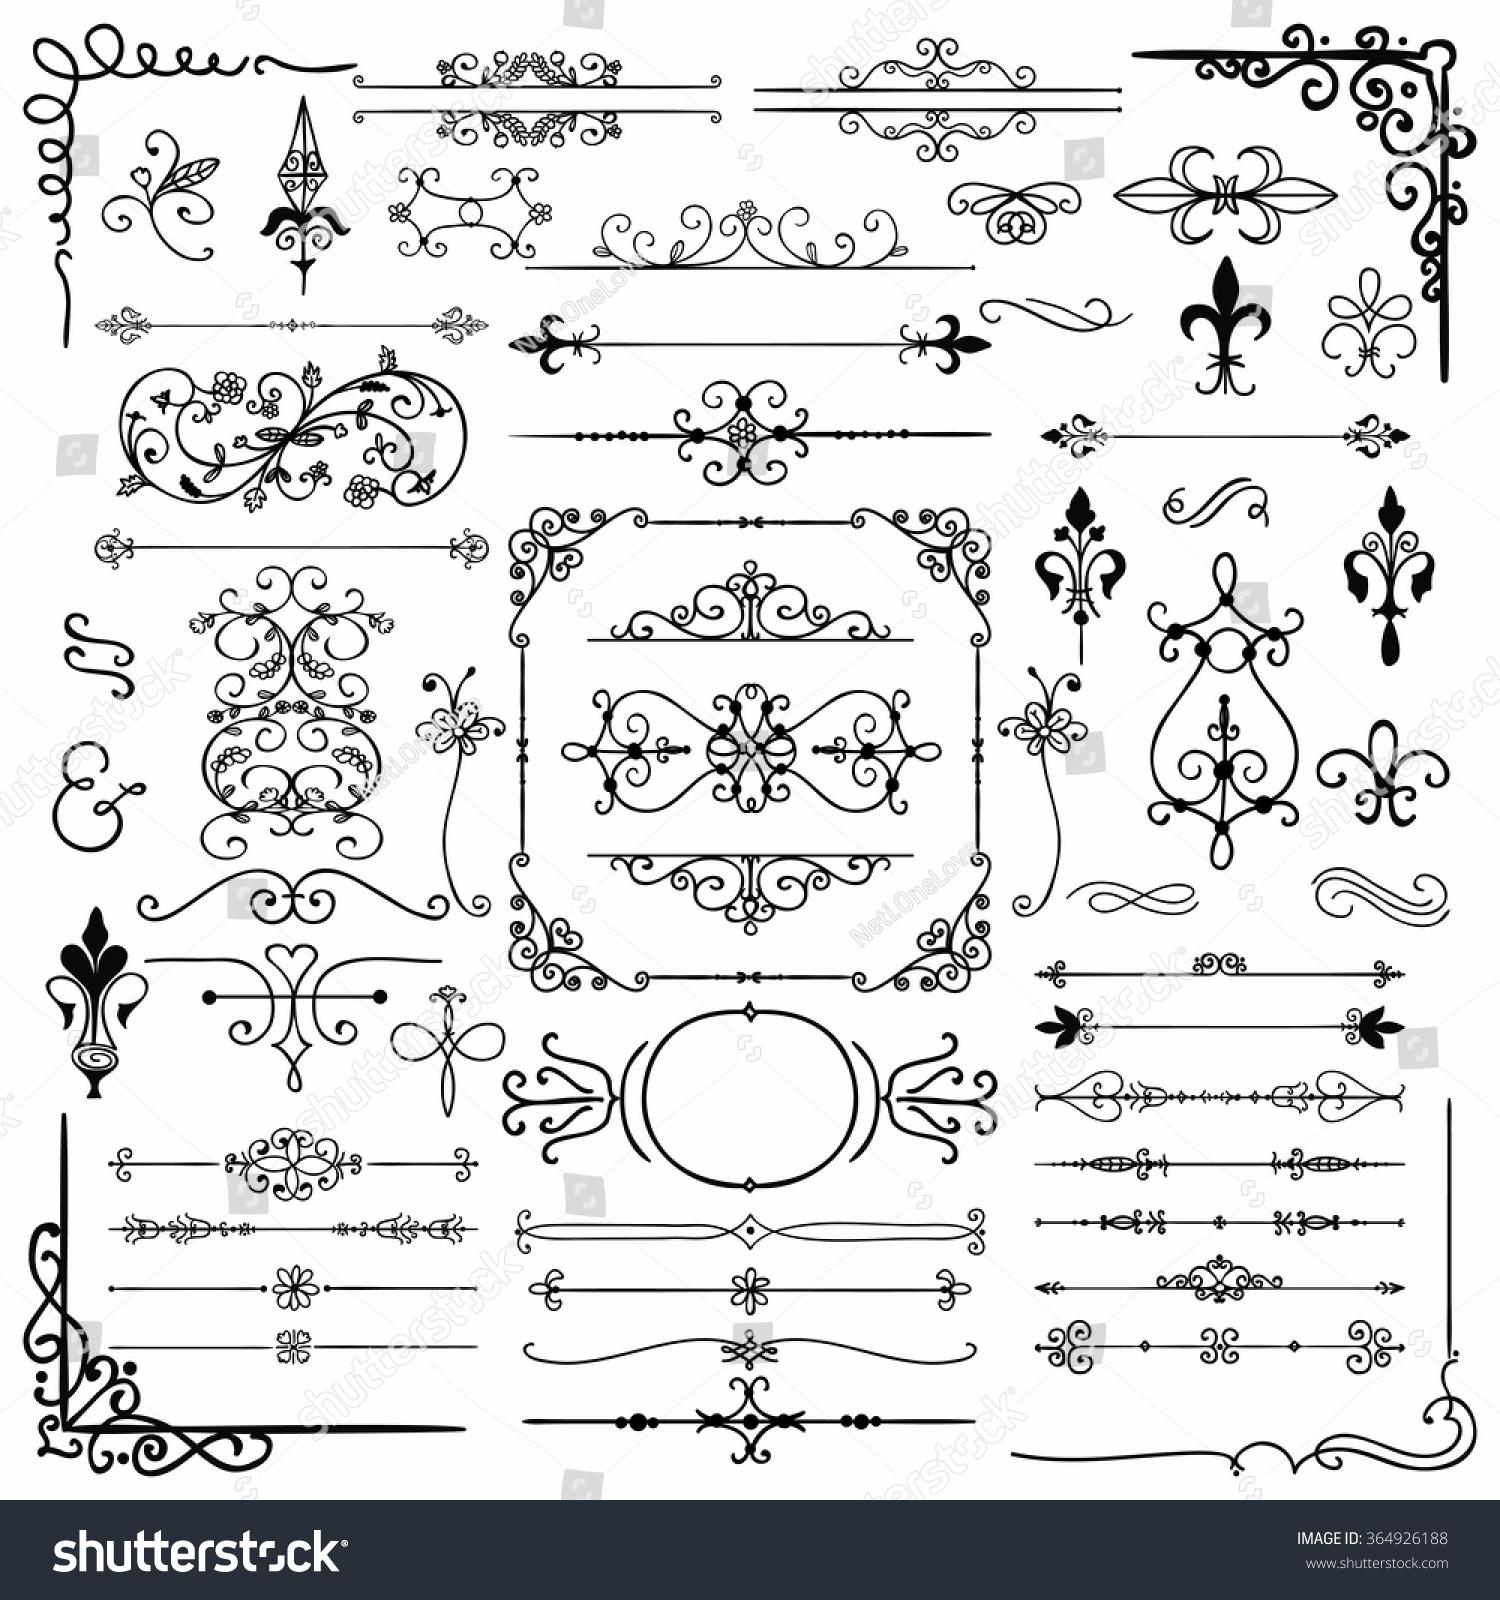 Black Hand Drawn Sketched Decorative Doodle Design Elements Frames Text Frames Dividers Borders Corners Swirls Scrolls Vector Illustration